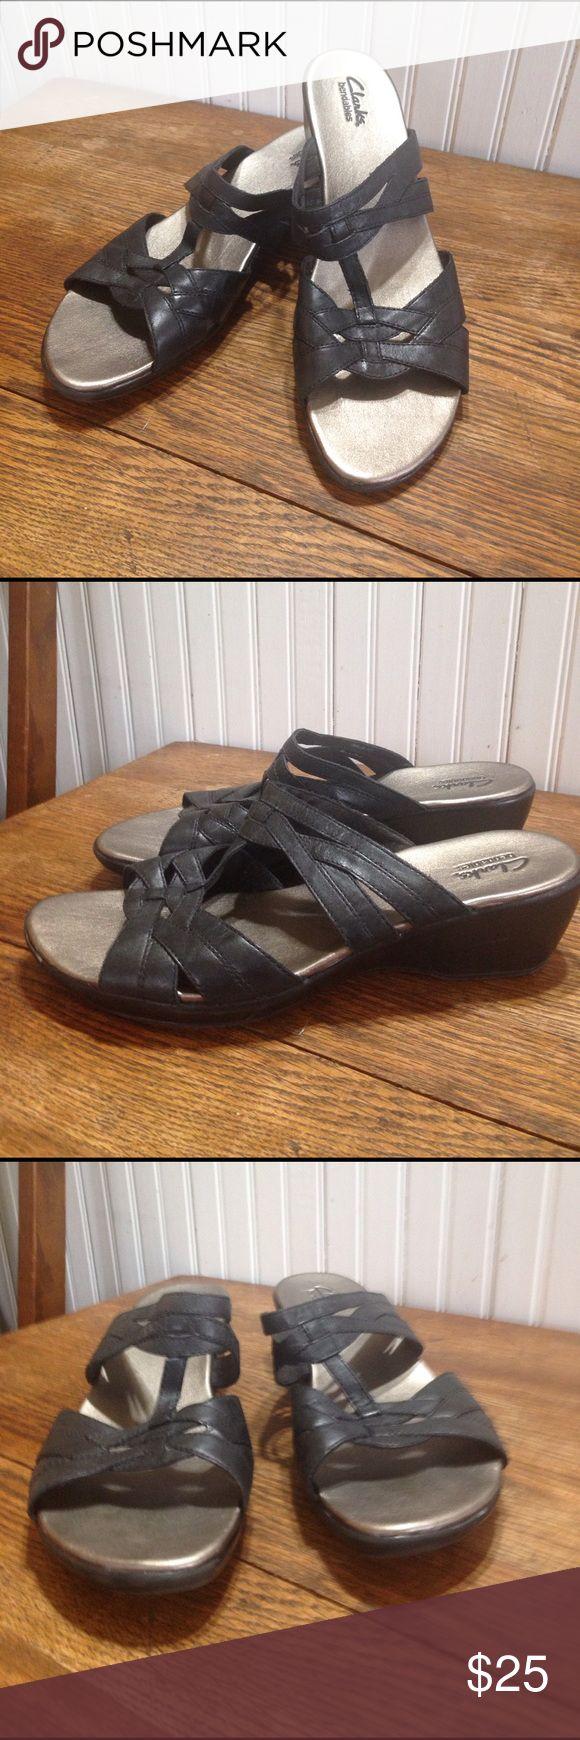 Black sandals size 11 - Clarks Bendables Black Pewter Sandals Size 11